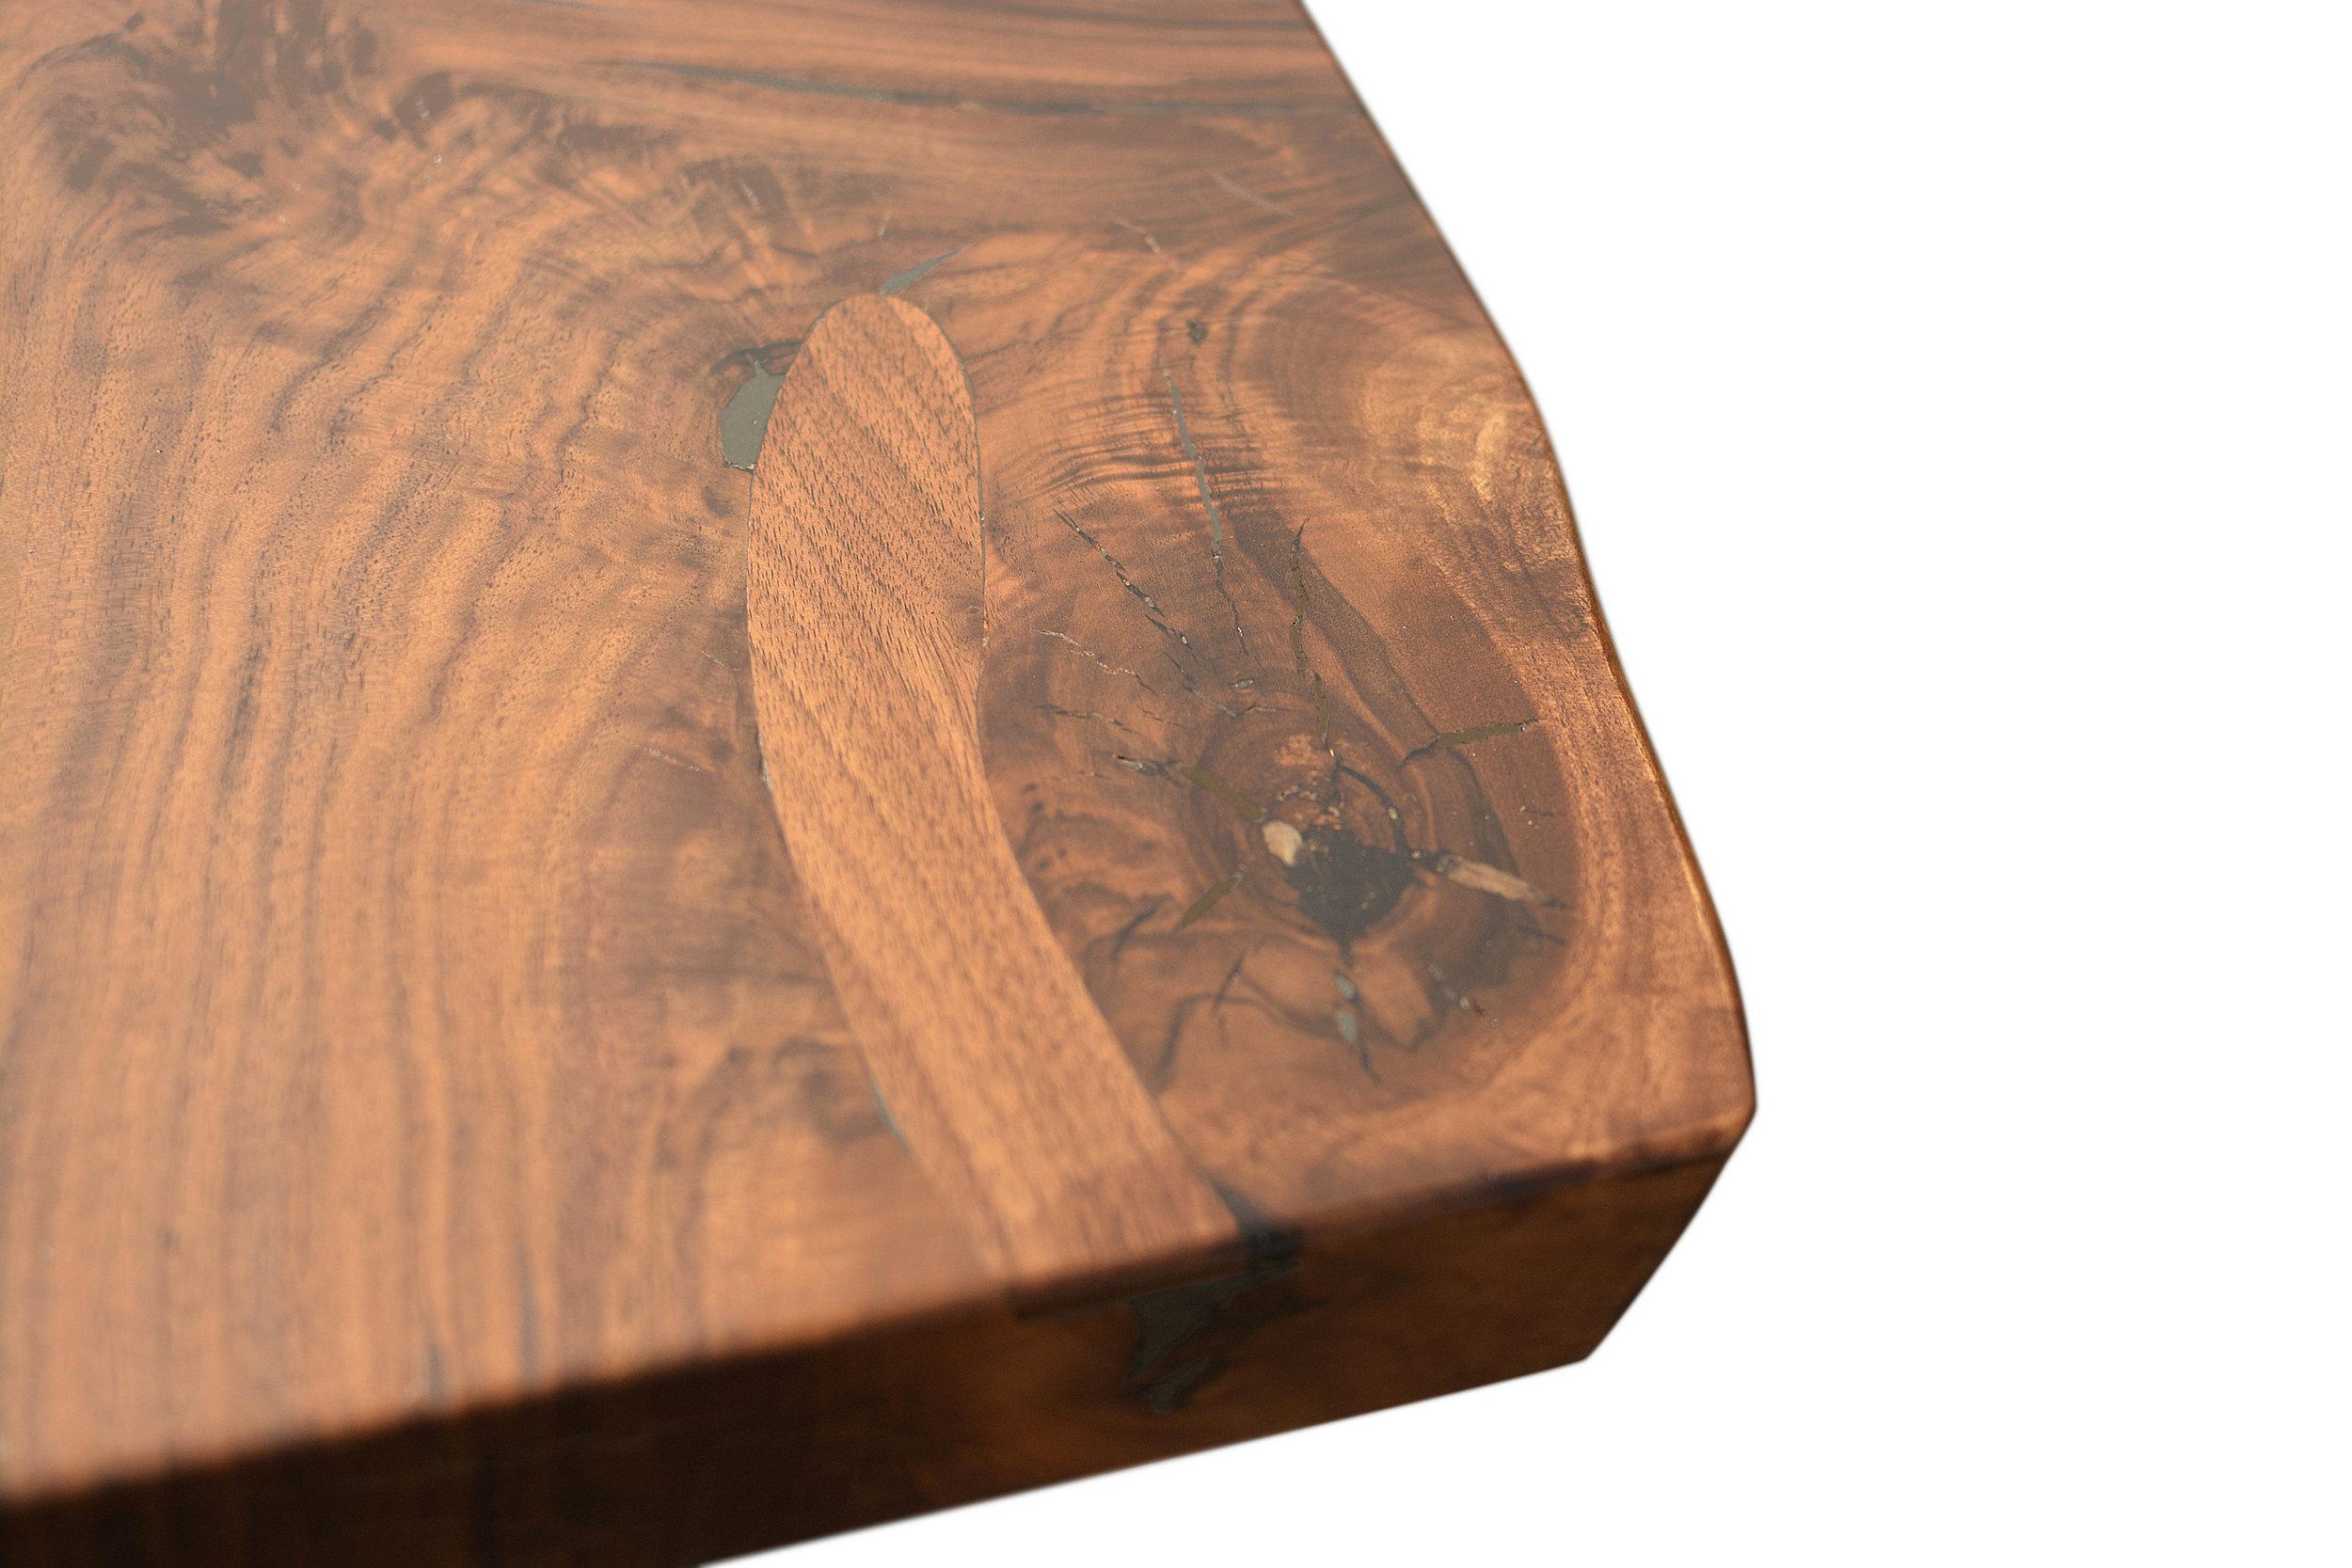 Etz & Steel Hermes Live Edge Walnut Table Close Up 10.JPG